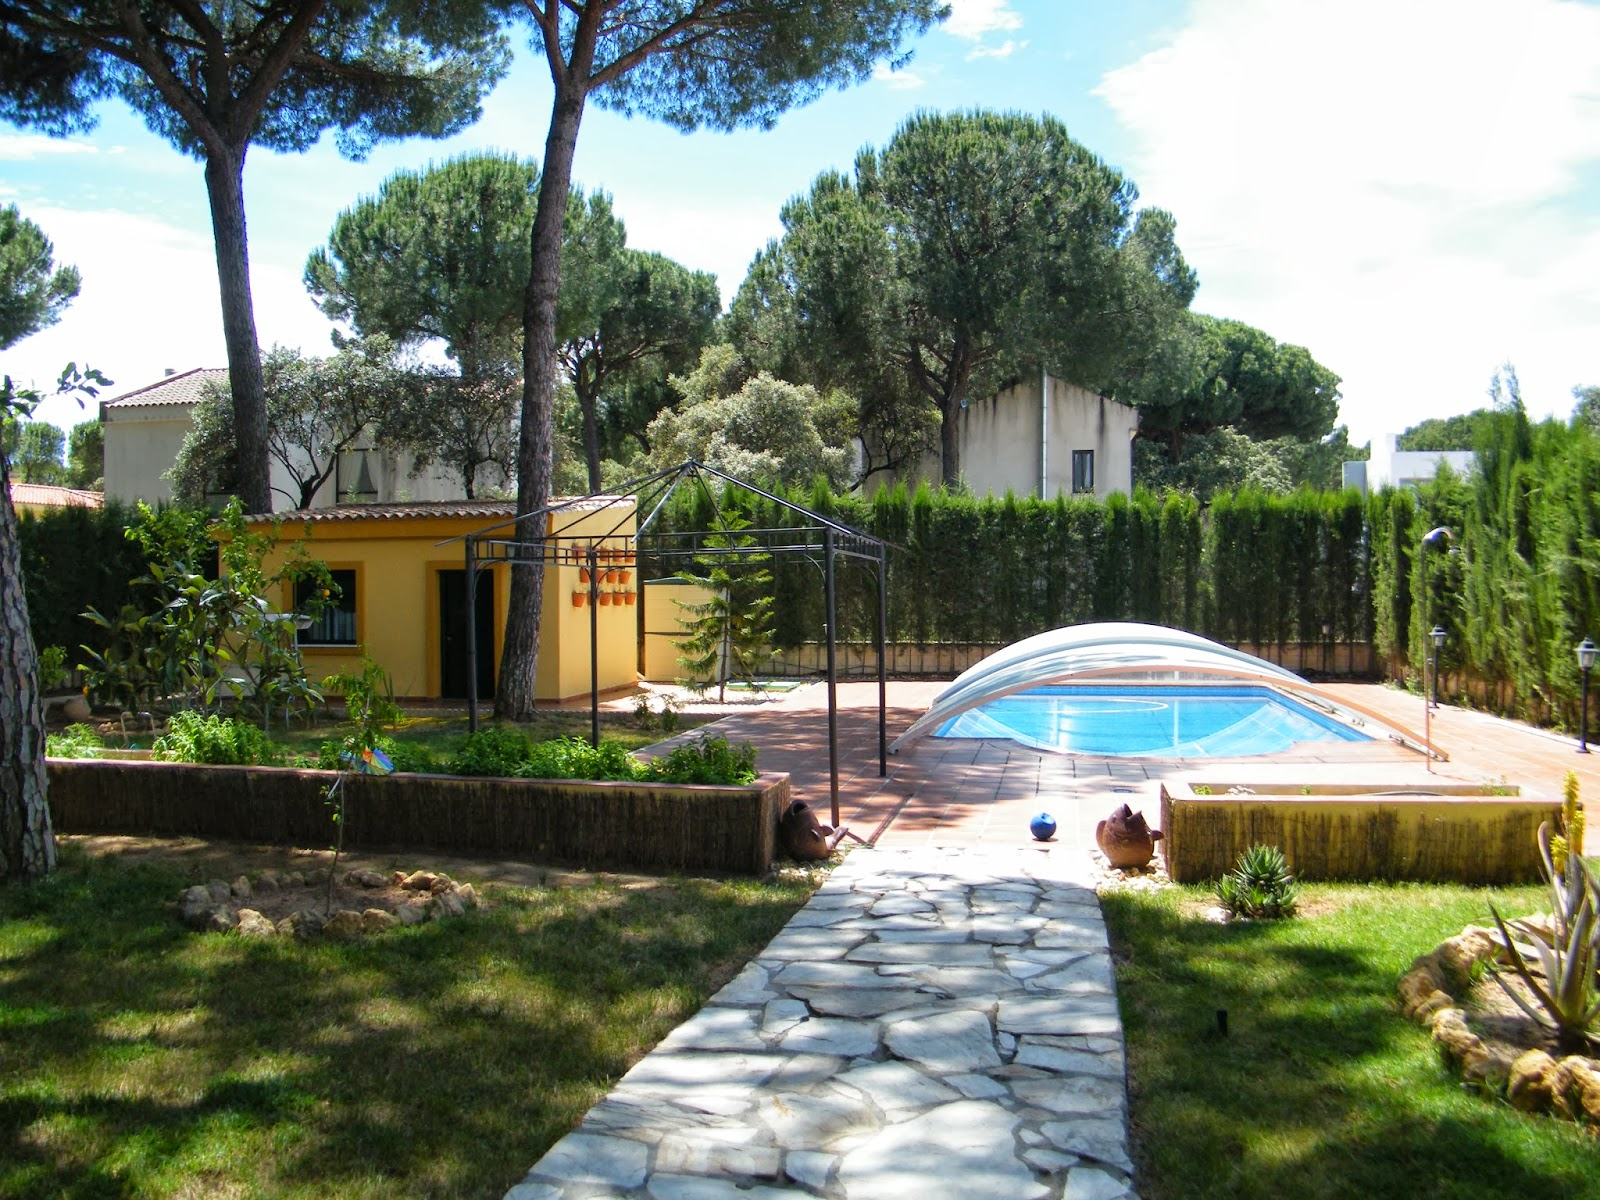 Grandes chalets en sevilla vivienda en la juliana for Piscina ciudad jardin sevilla